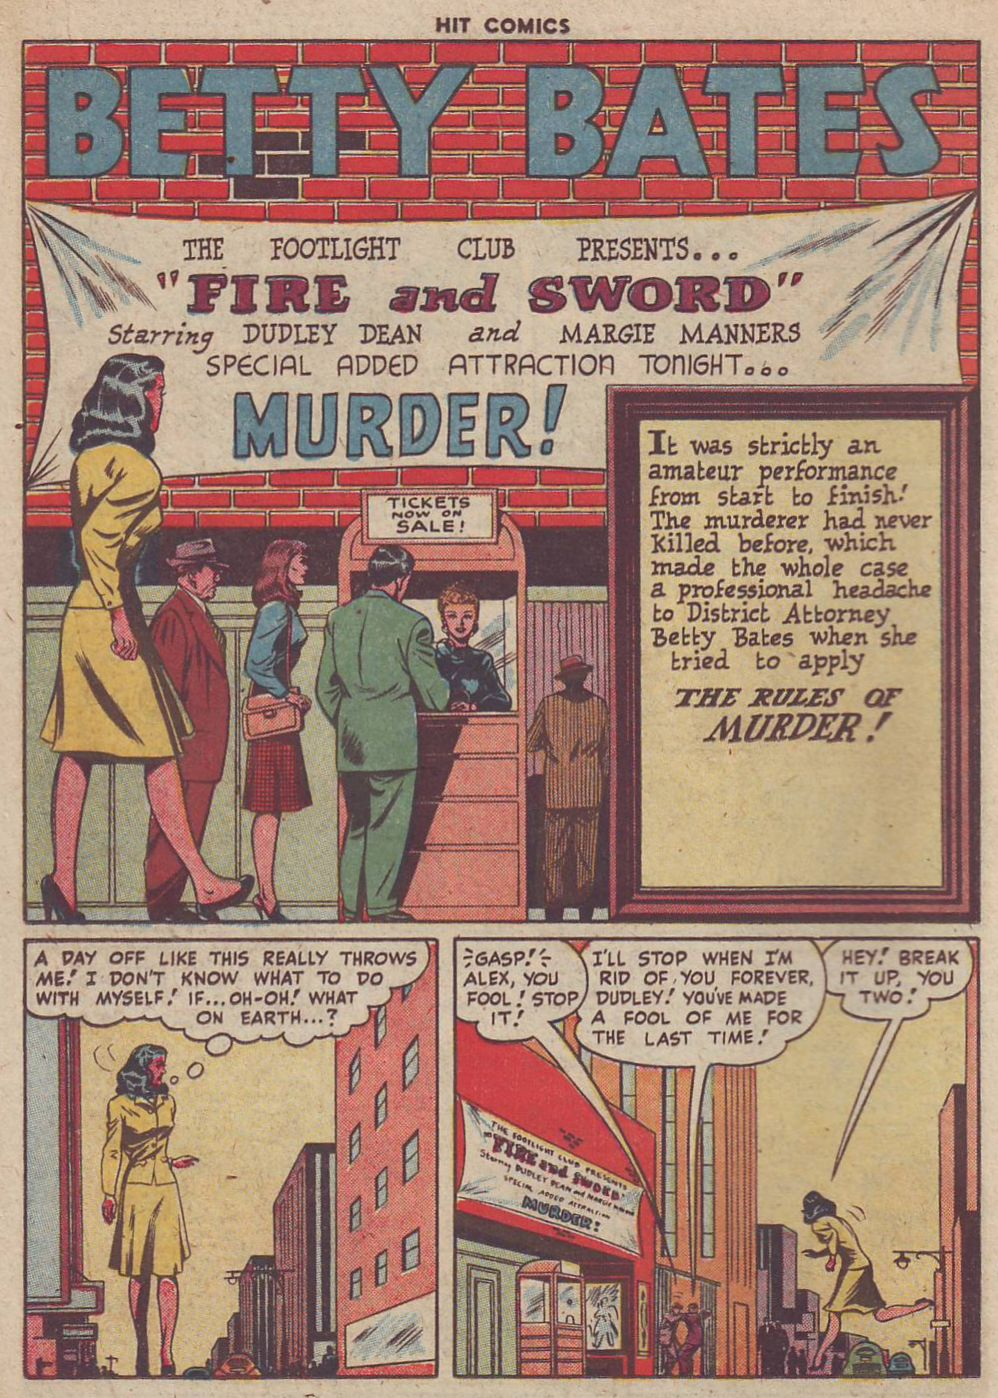 Read online Hit Comics comic -  Issue #51 - 26